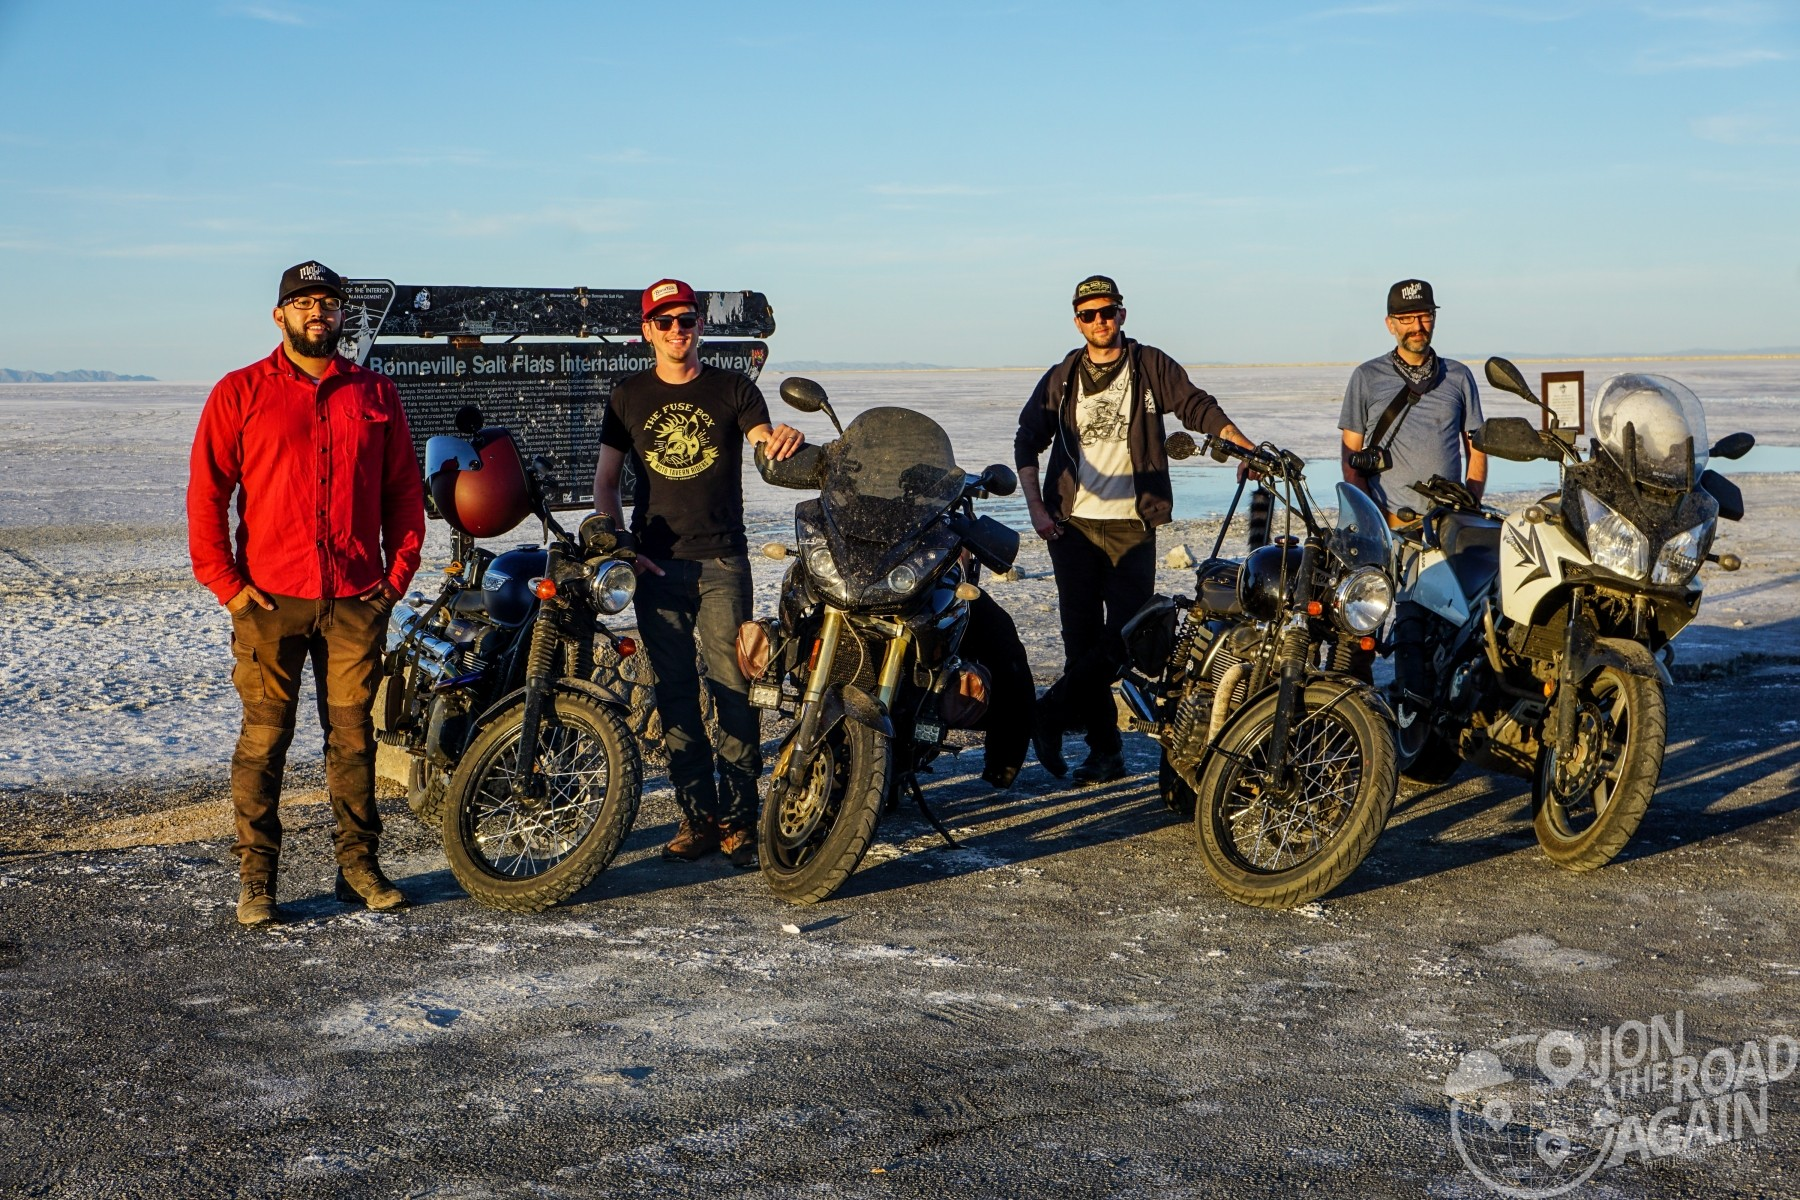 Fuse Box Riders at Bonneville Salt Flats